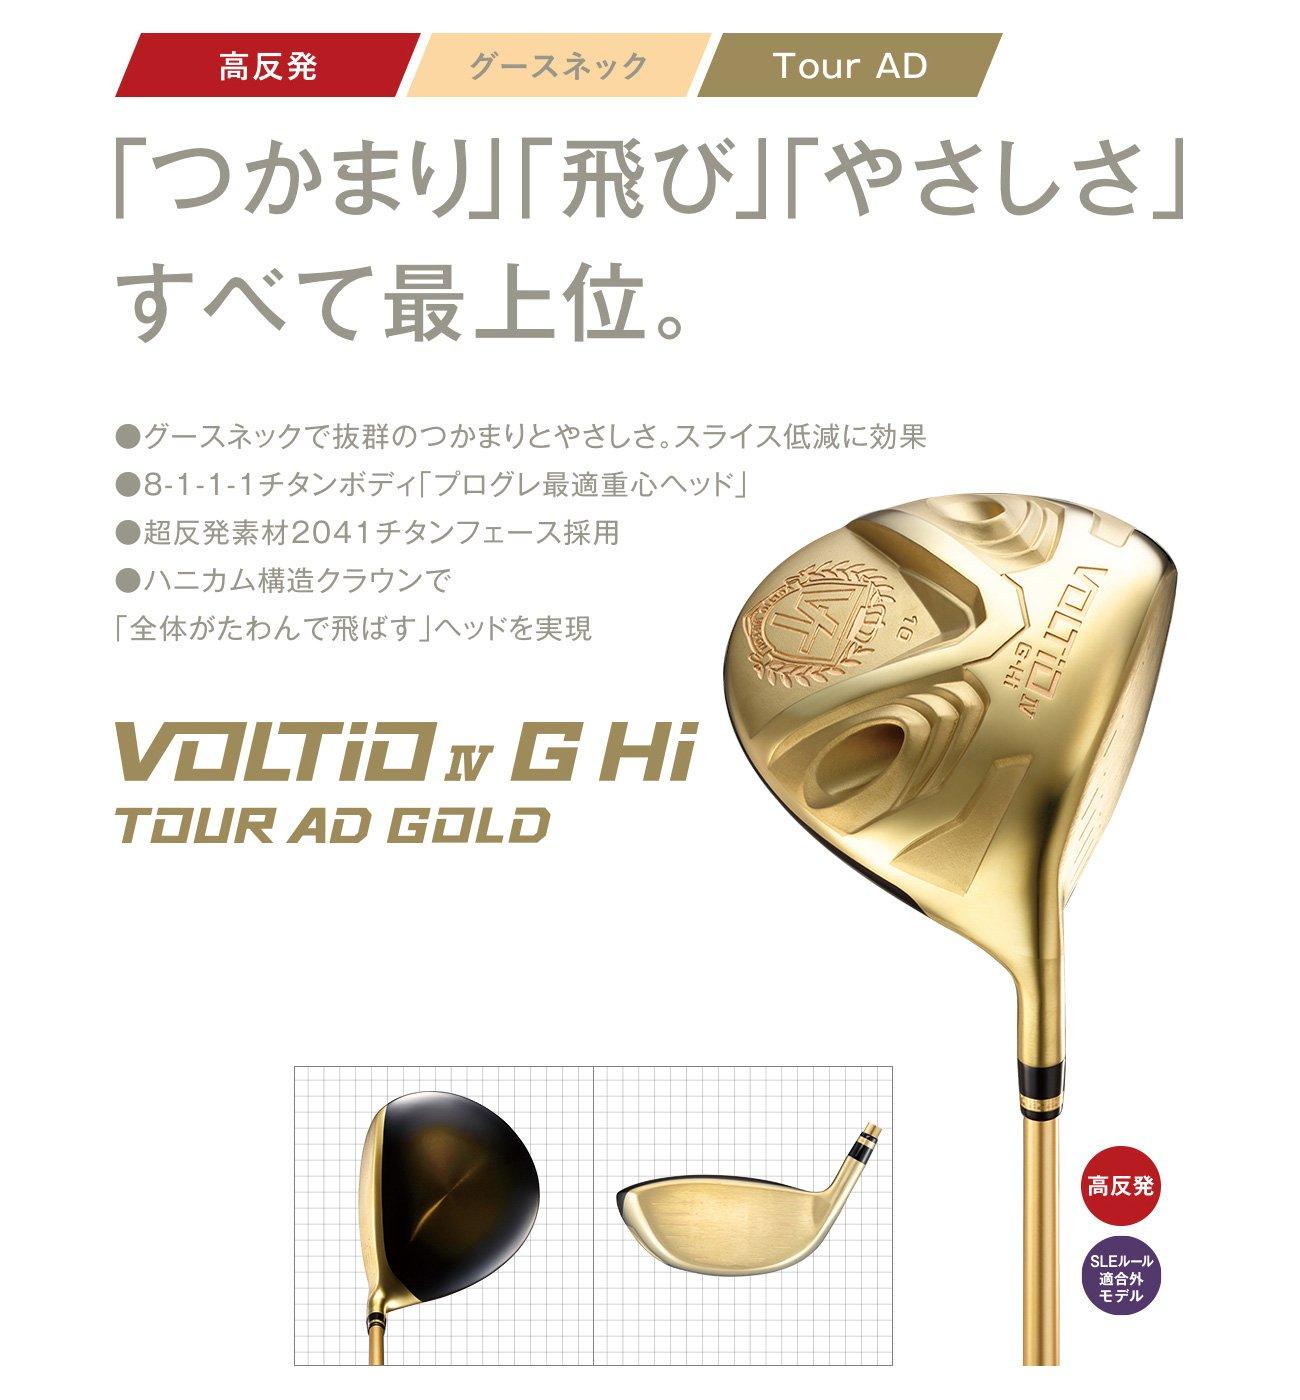 Katana Golf Japón voltio IV G Hi conductor oro 10SR Tour Ad ...